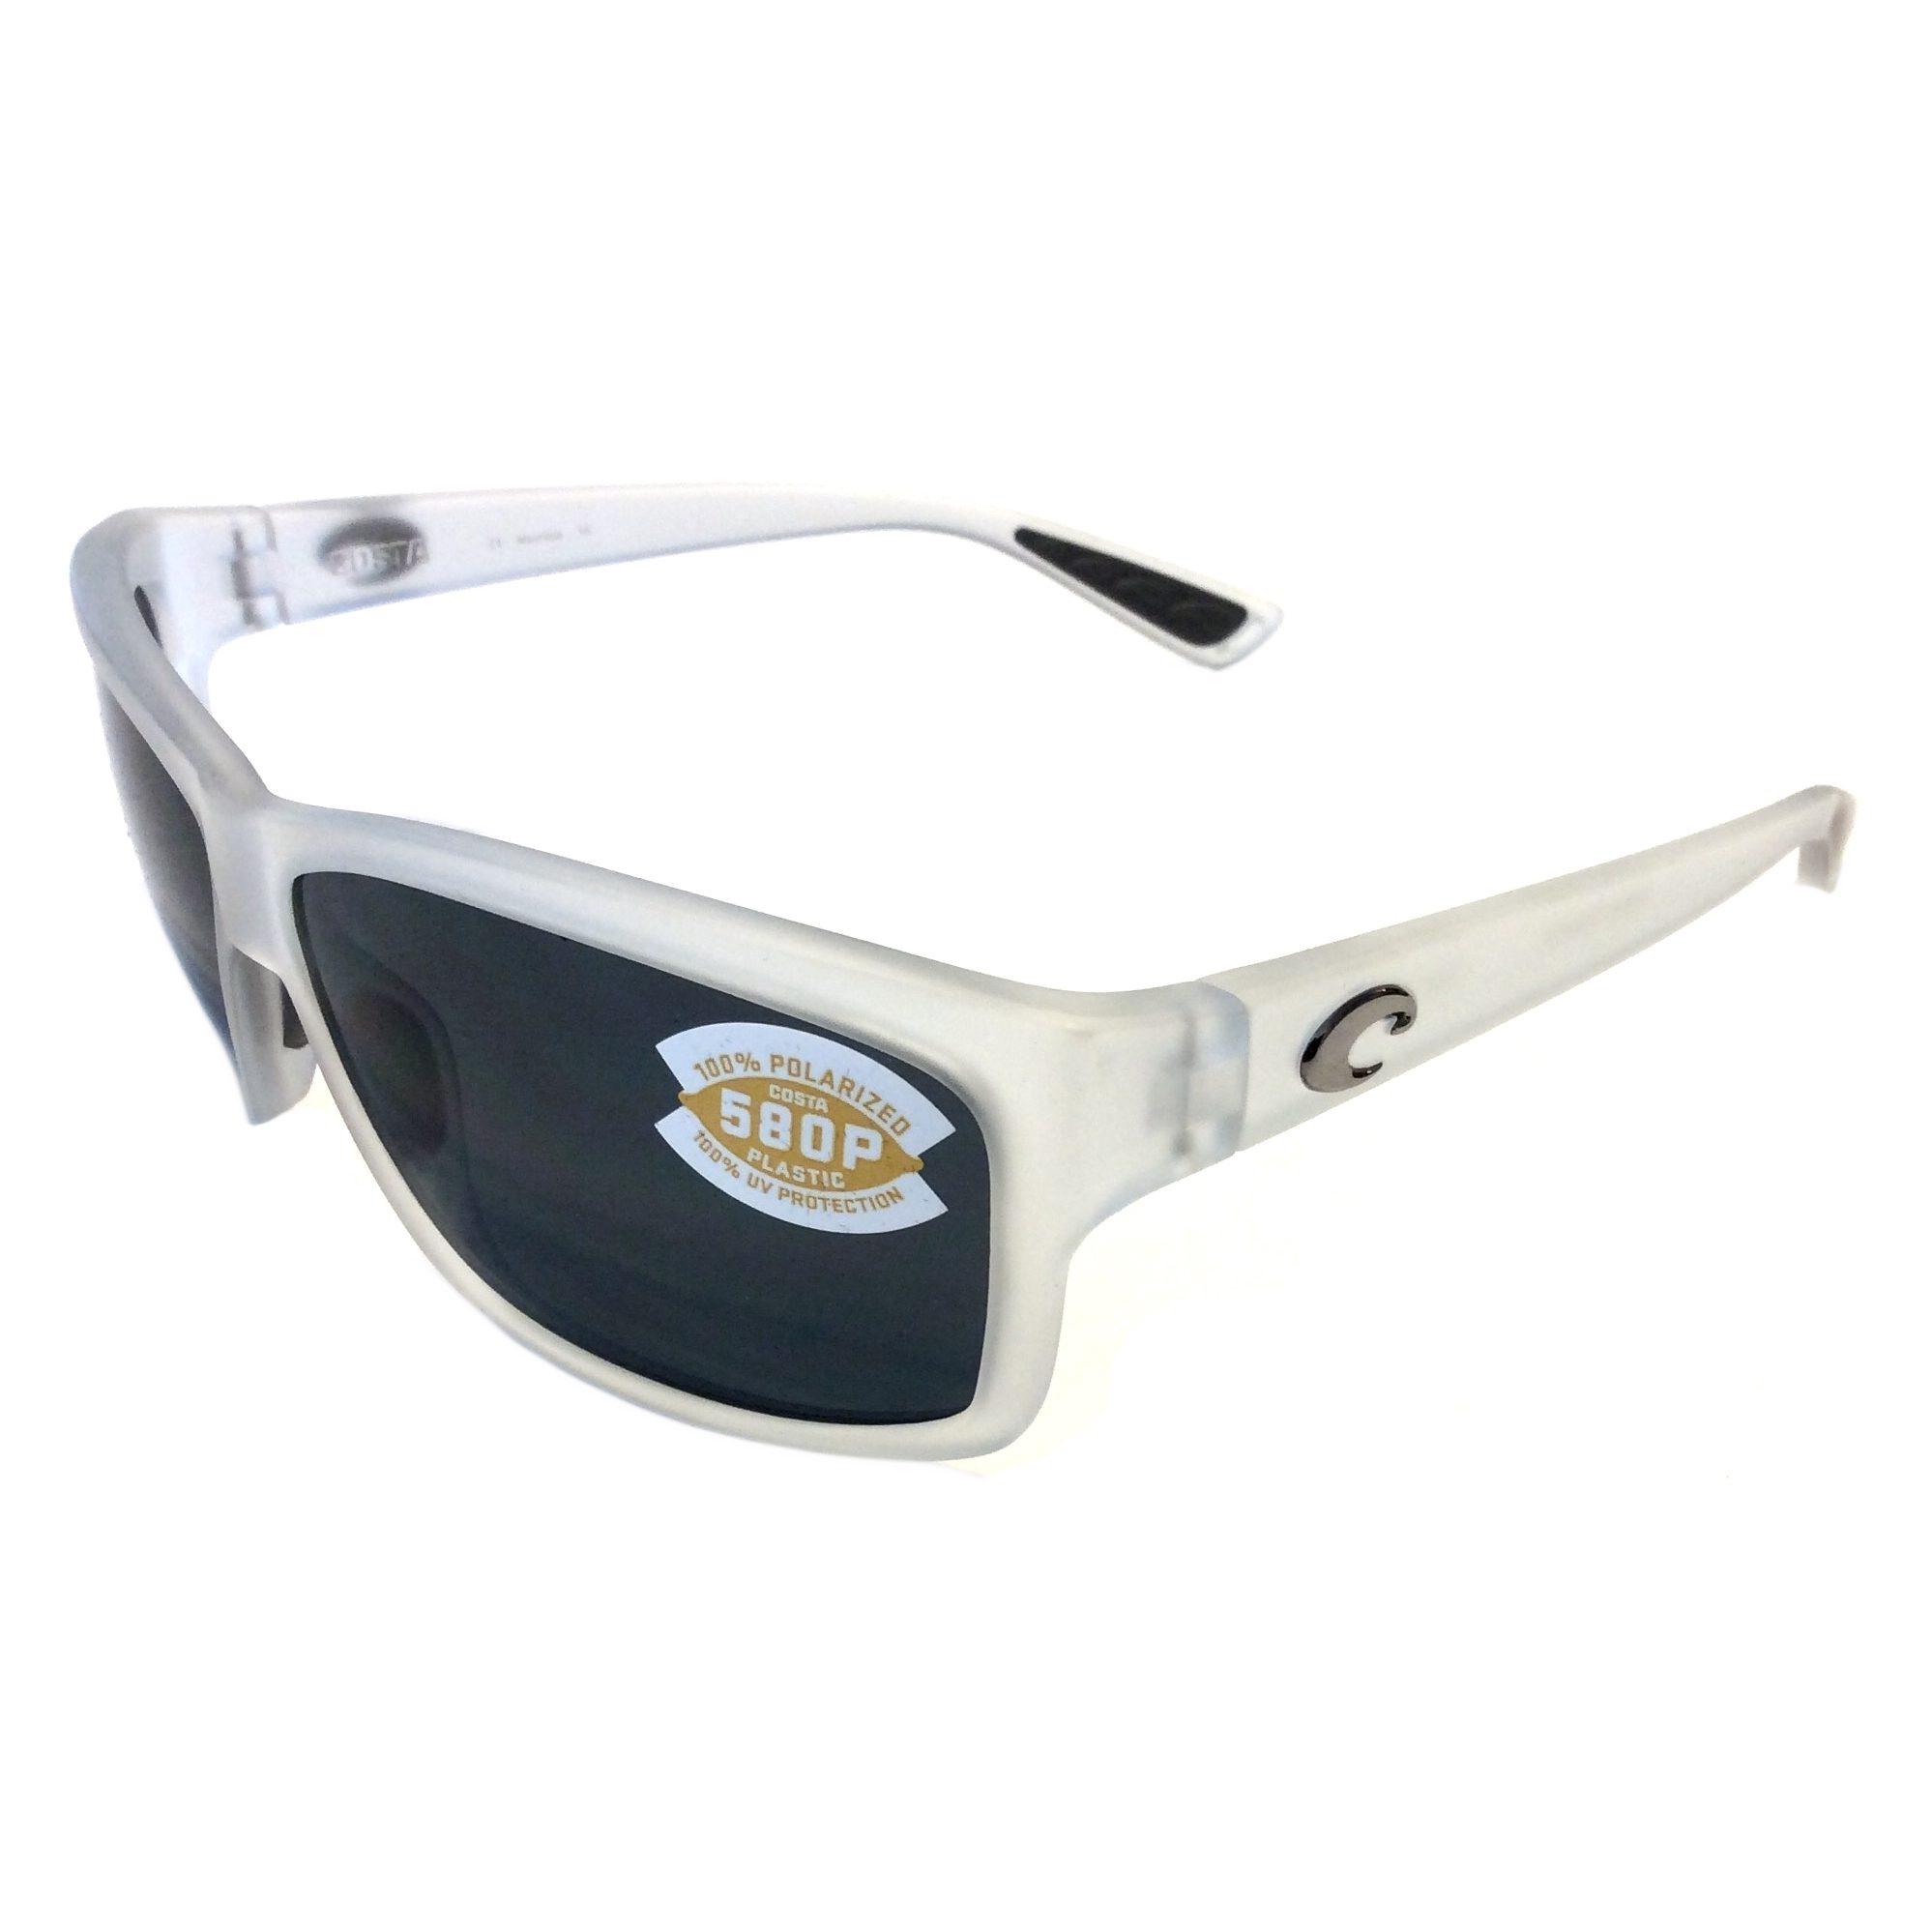 afb3014c13aa Costa Del Mar Cut Sunglasses - Matte Crystal - POLARIZED Gray - 580P